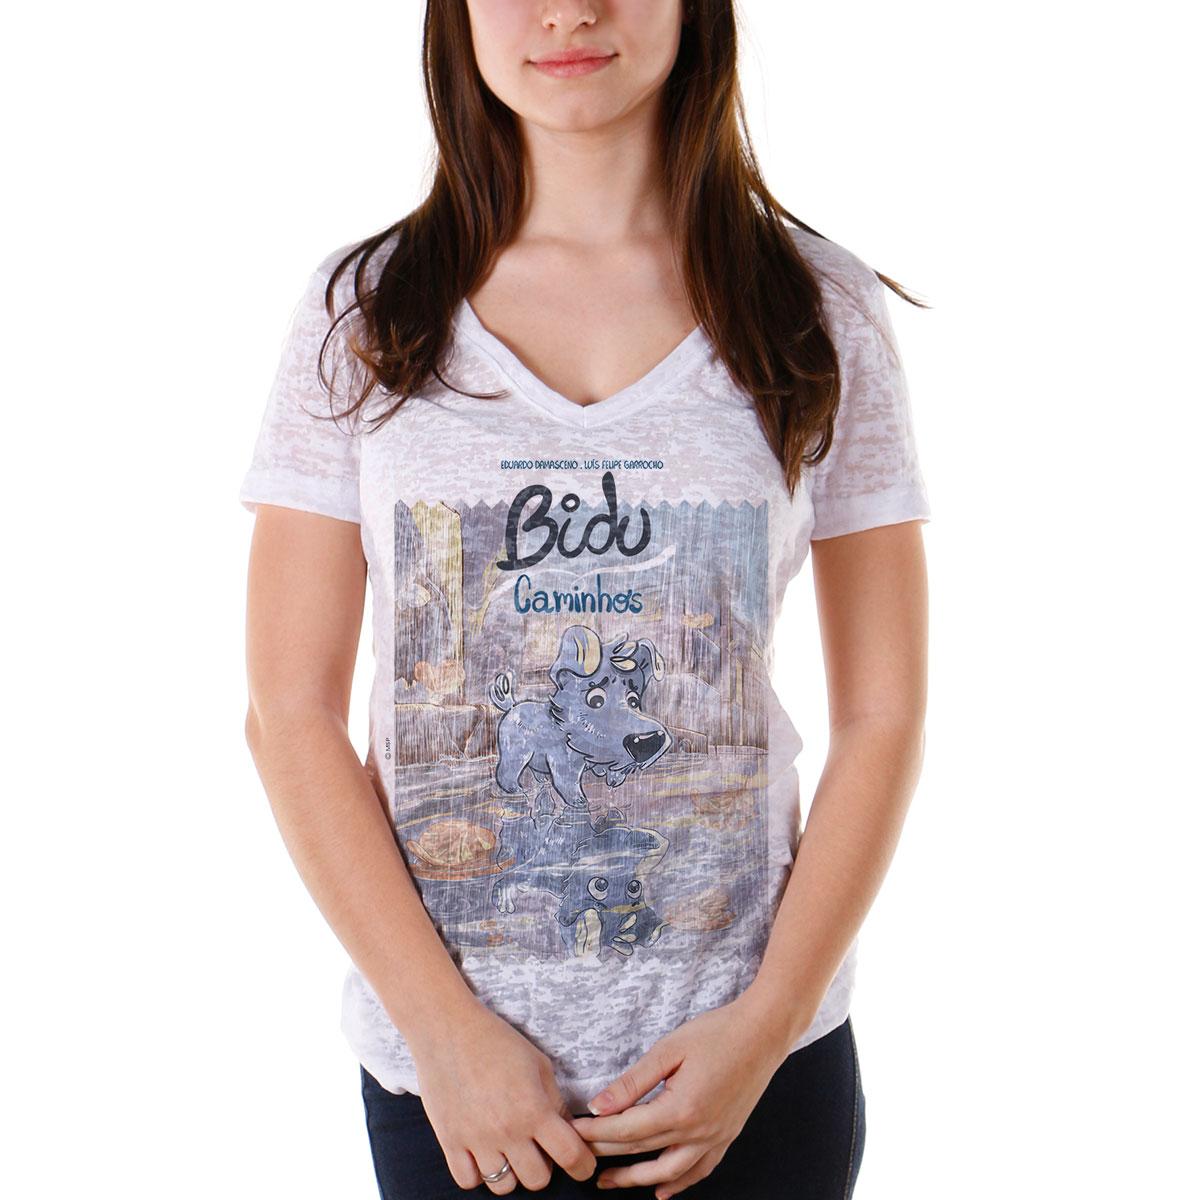 Camiseta Devorê Feminina Turma da Mônica Bidu Caminhos